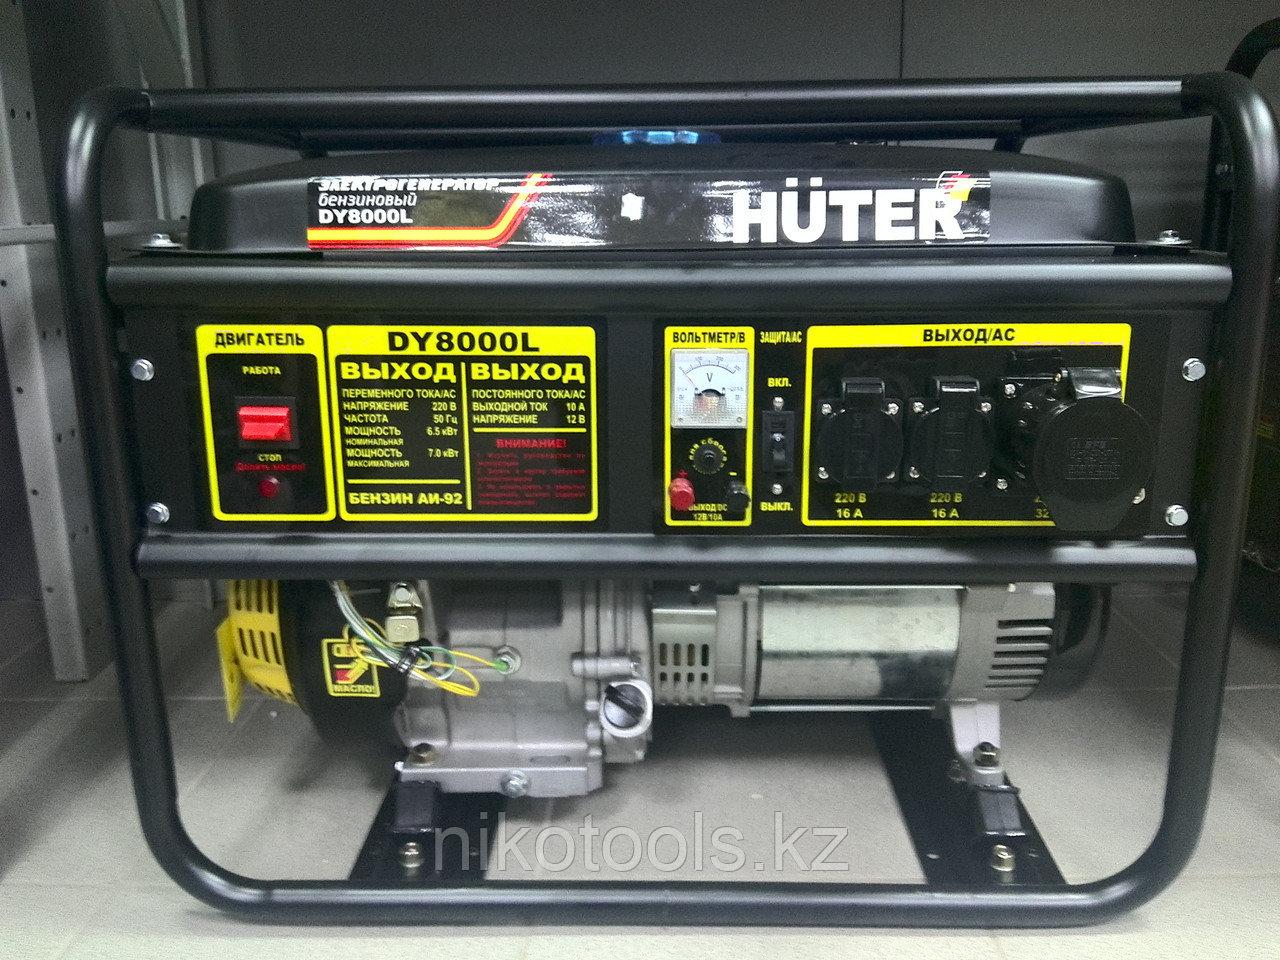 Электрогенератор Huter 8000L DY в Караганде